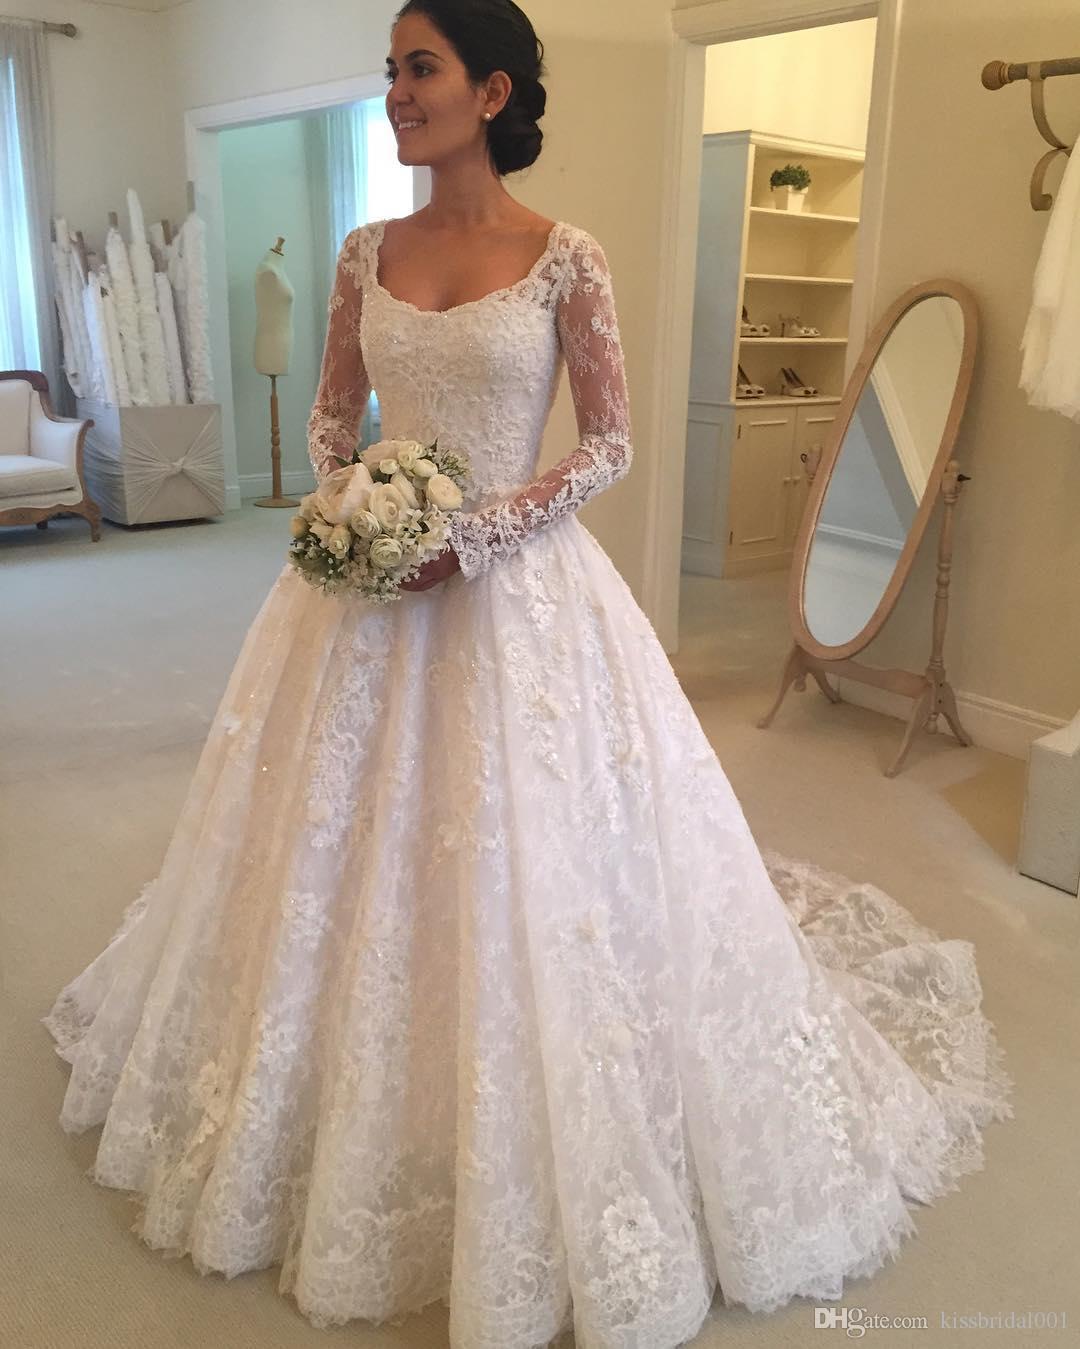 Elegant 2018 Lace Wedding Dress Long Bridal Gown Custom Size 2 4 6 8 10 12 14 16